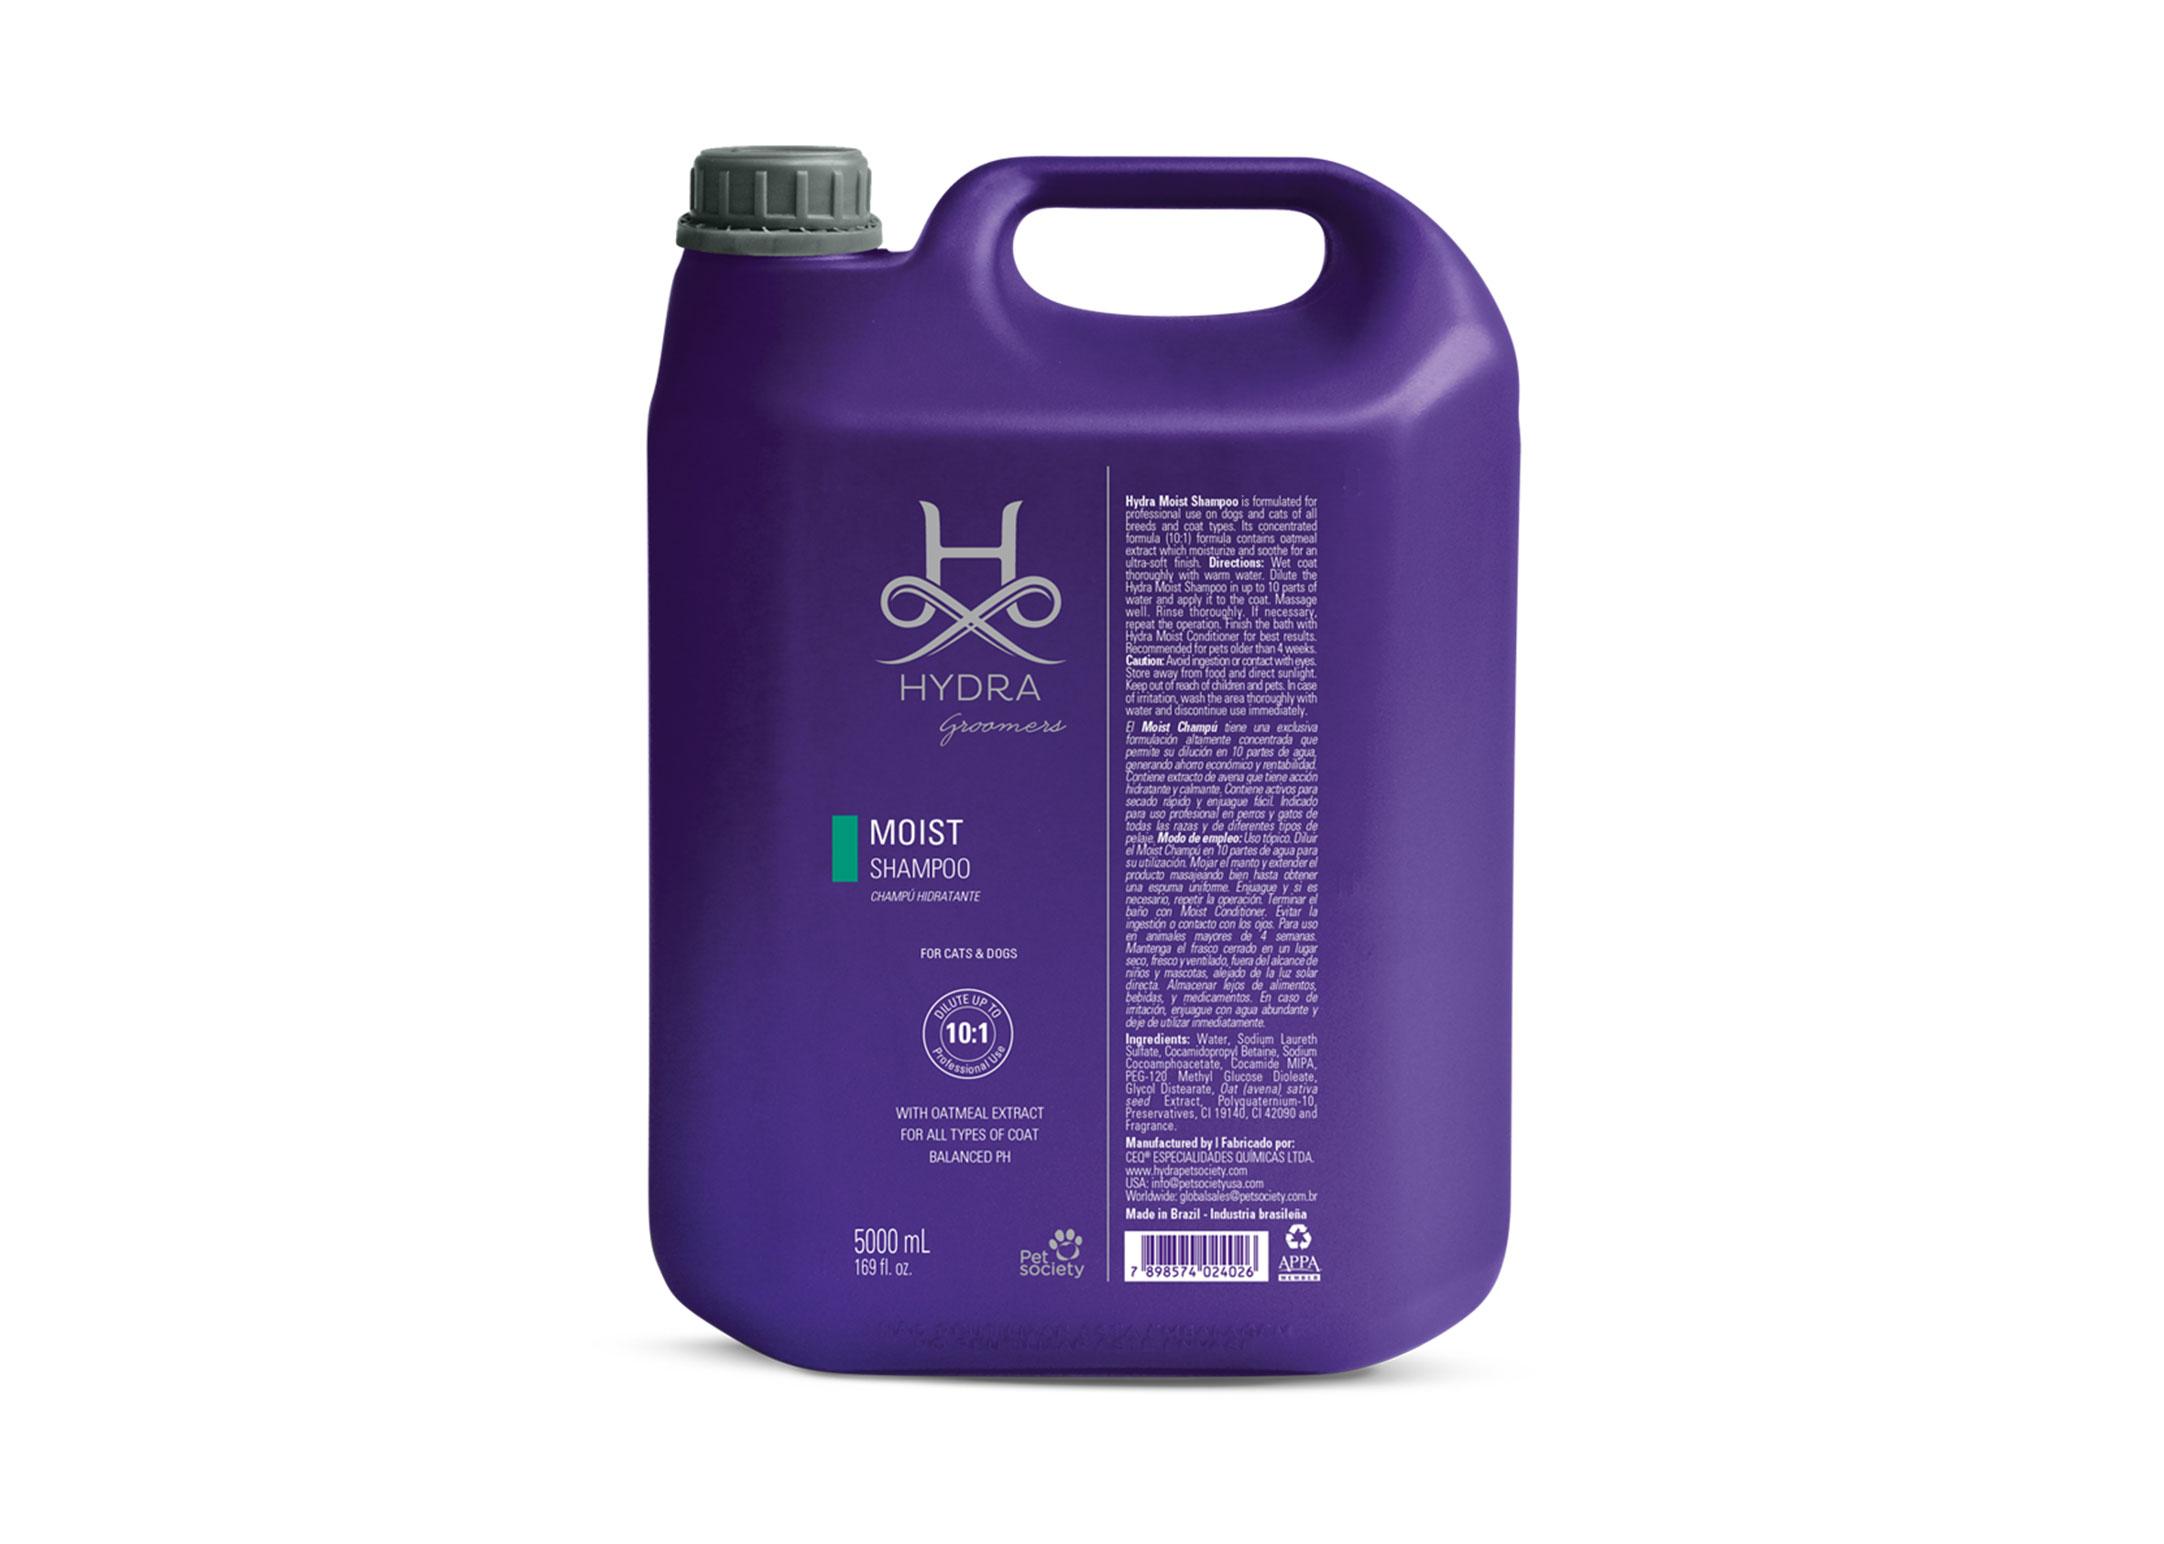 Hydra Moist Shampoo